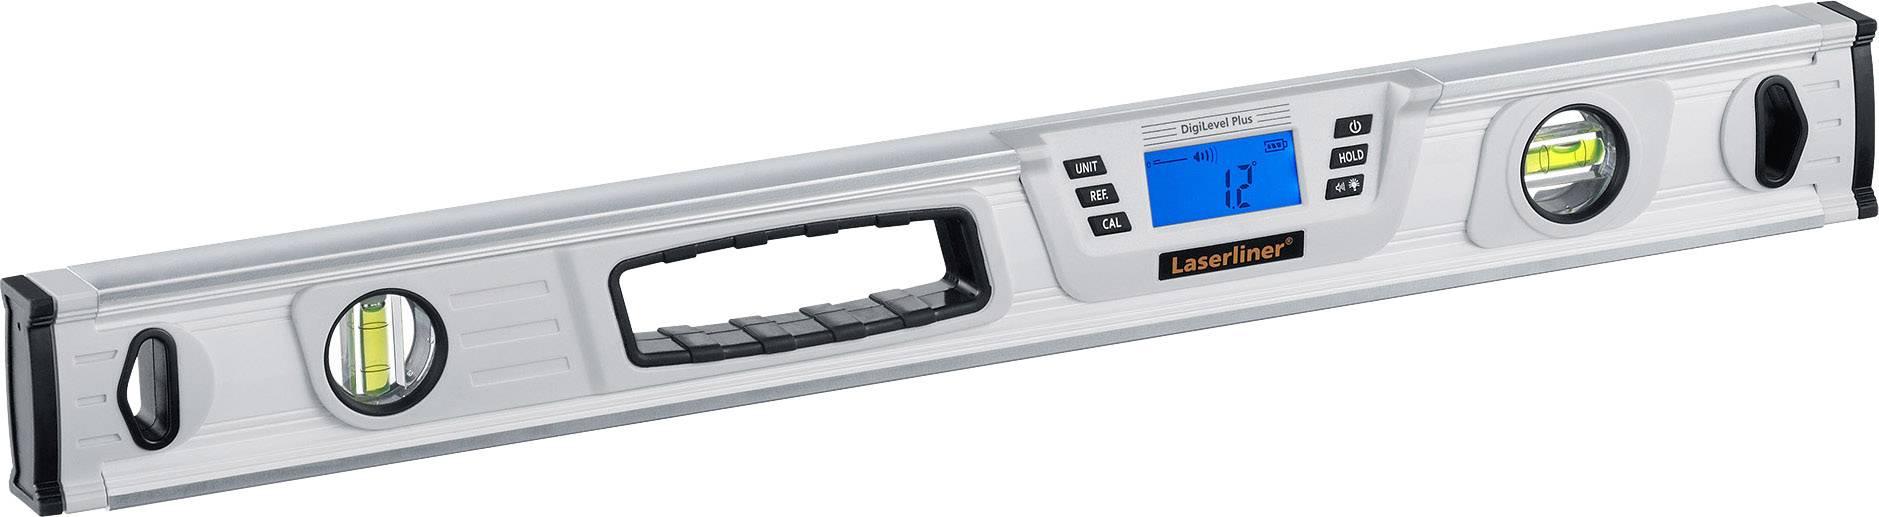 Digitálna vodováha Laserliner DigiLevel Plus 60 081.251A, 60 cm